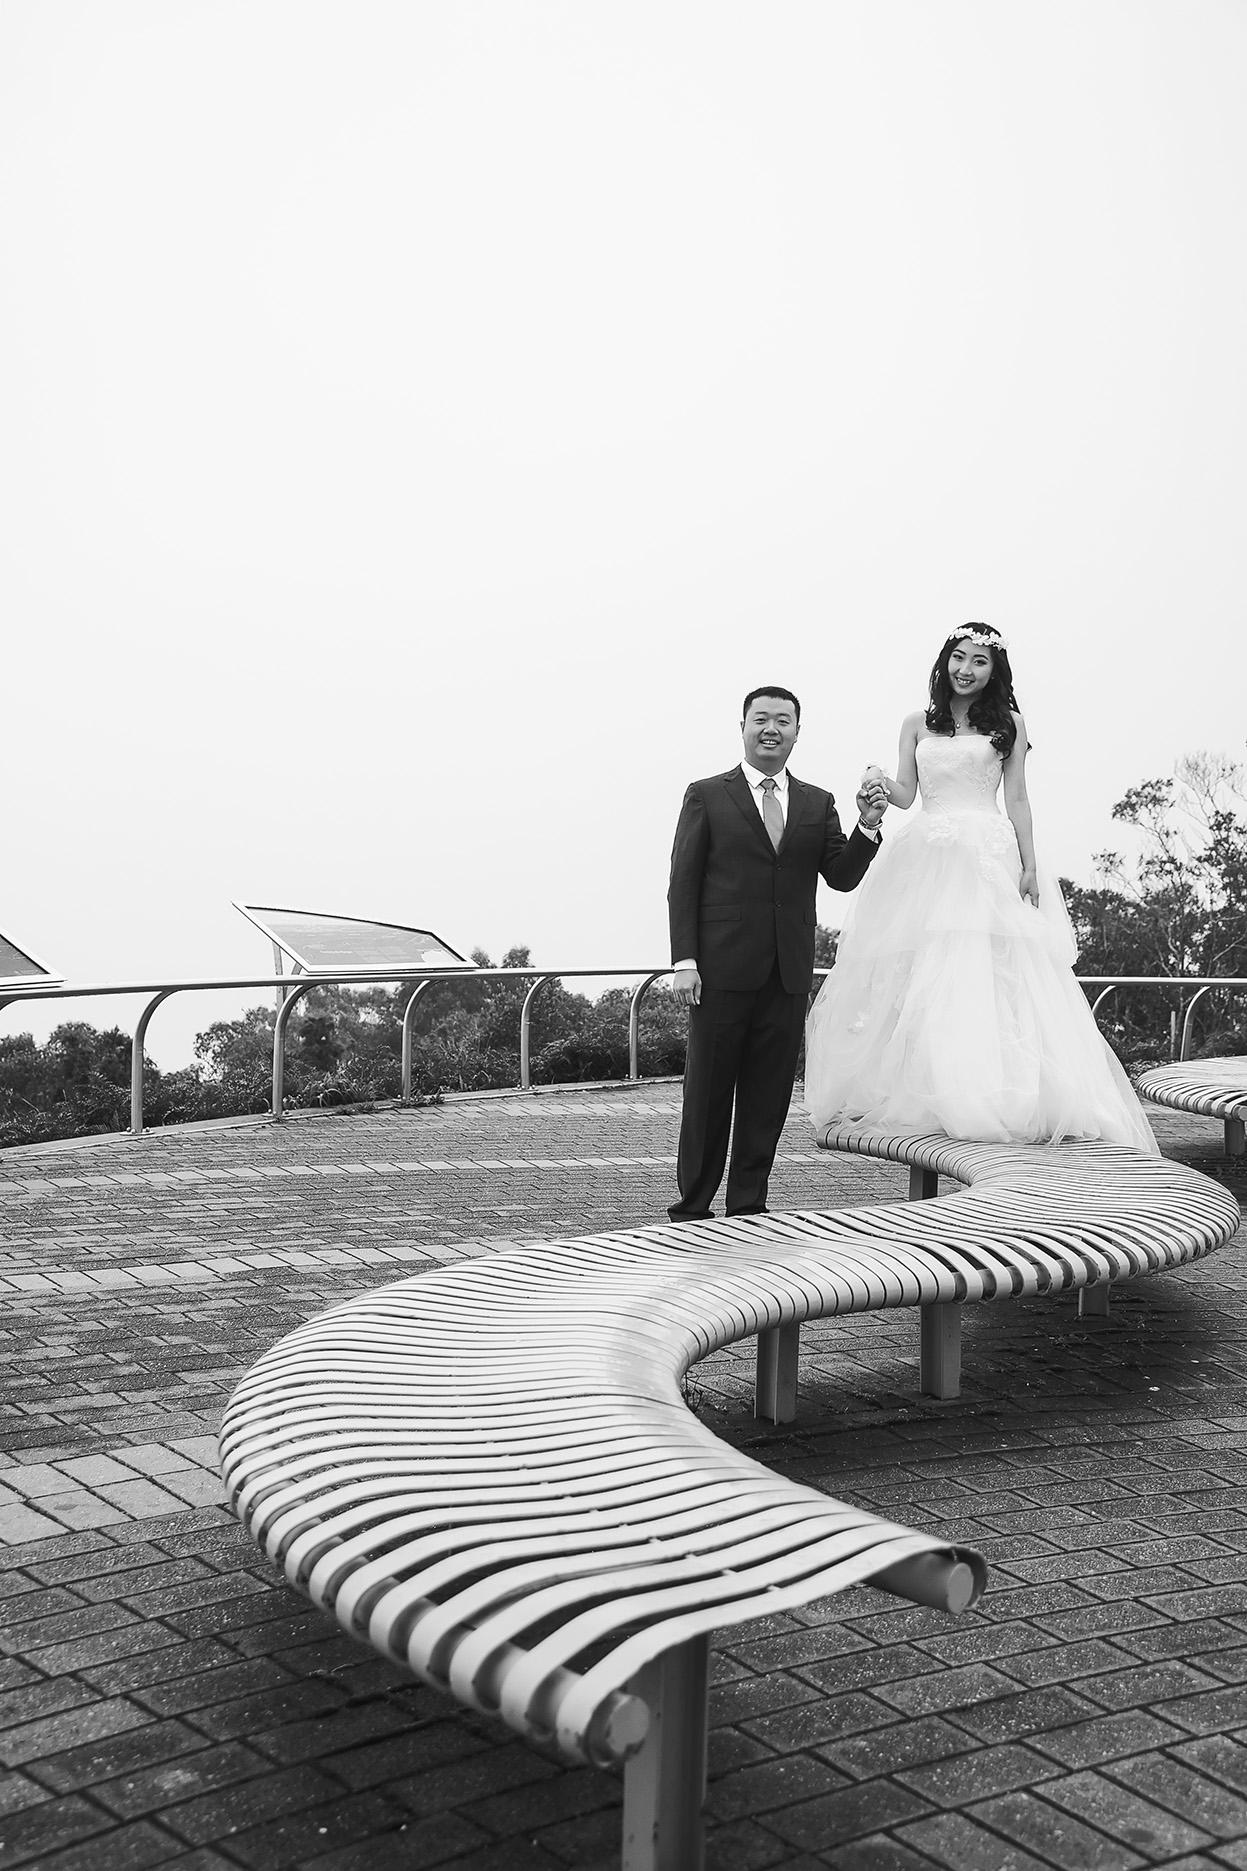 Artistic Black and White Wedding Photo 3